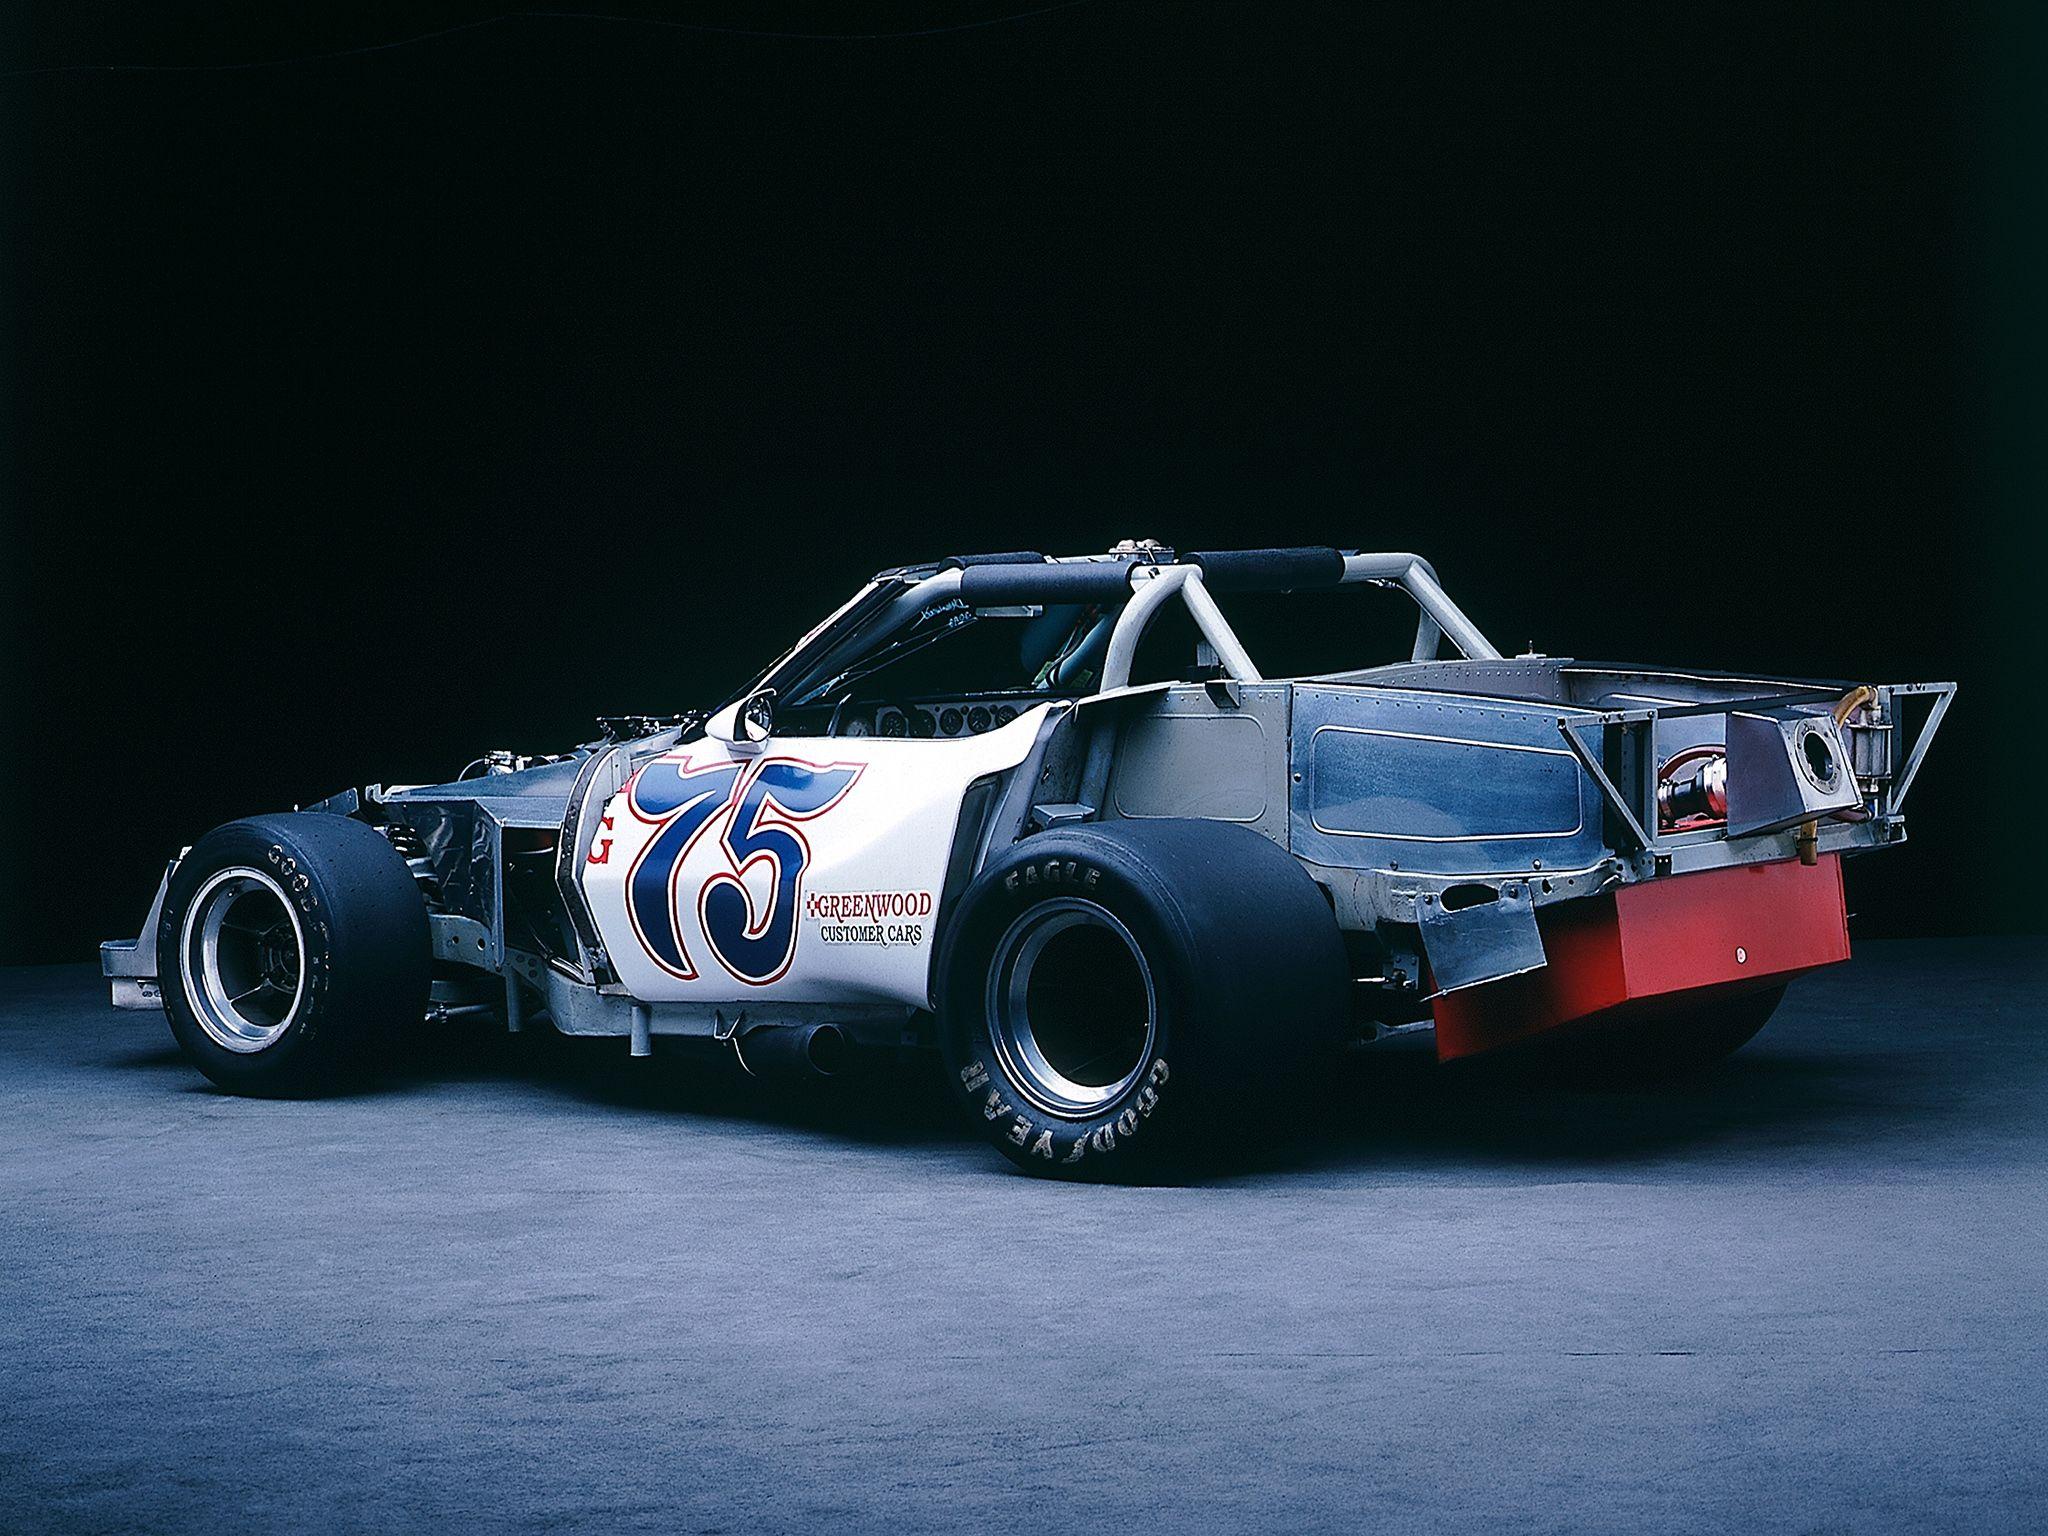 1974 Greenwood Chevrolet Corvette Imsa Road Racing G T C 3